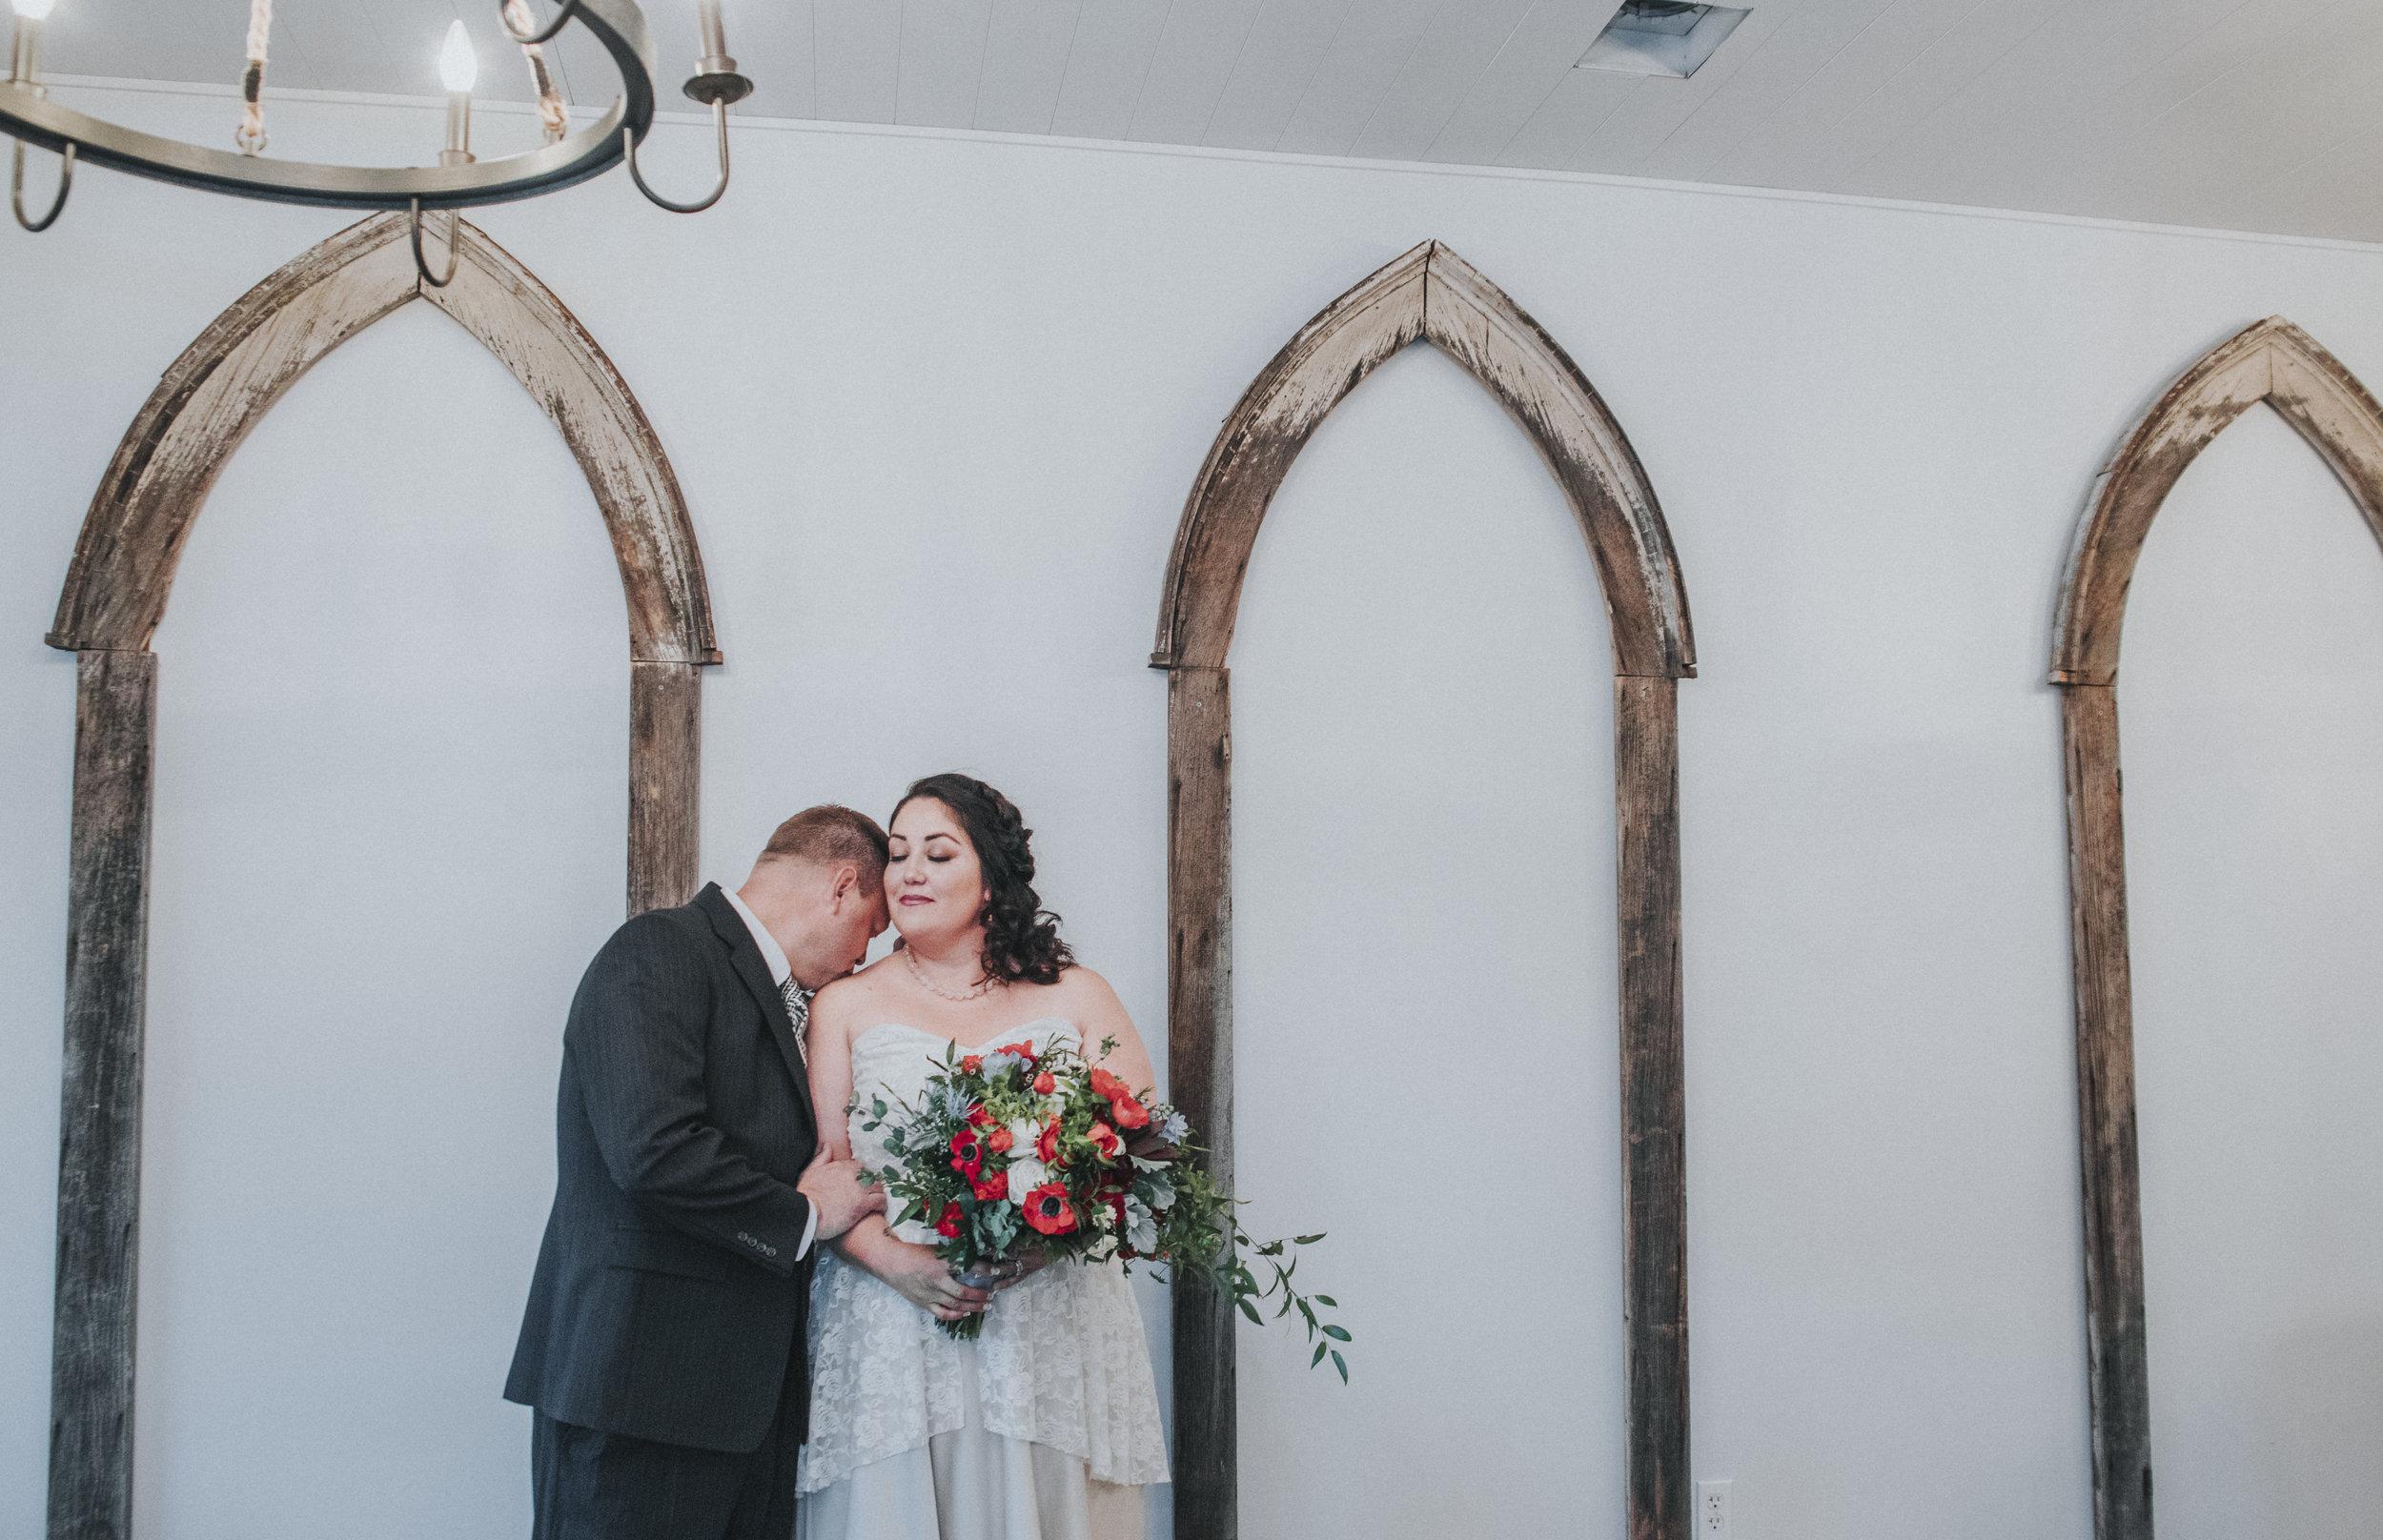 103 midwest-colorado-nebraska-elopement-photography-gretna-turtledoves.jpg